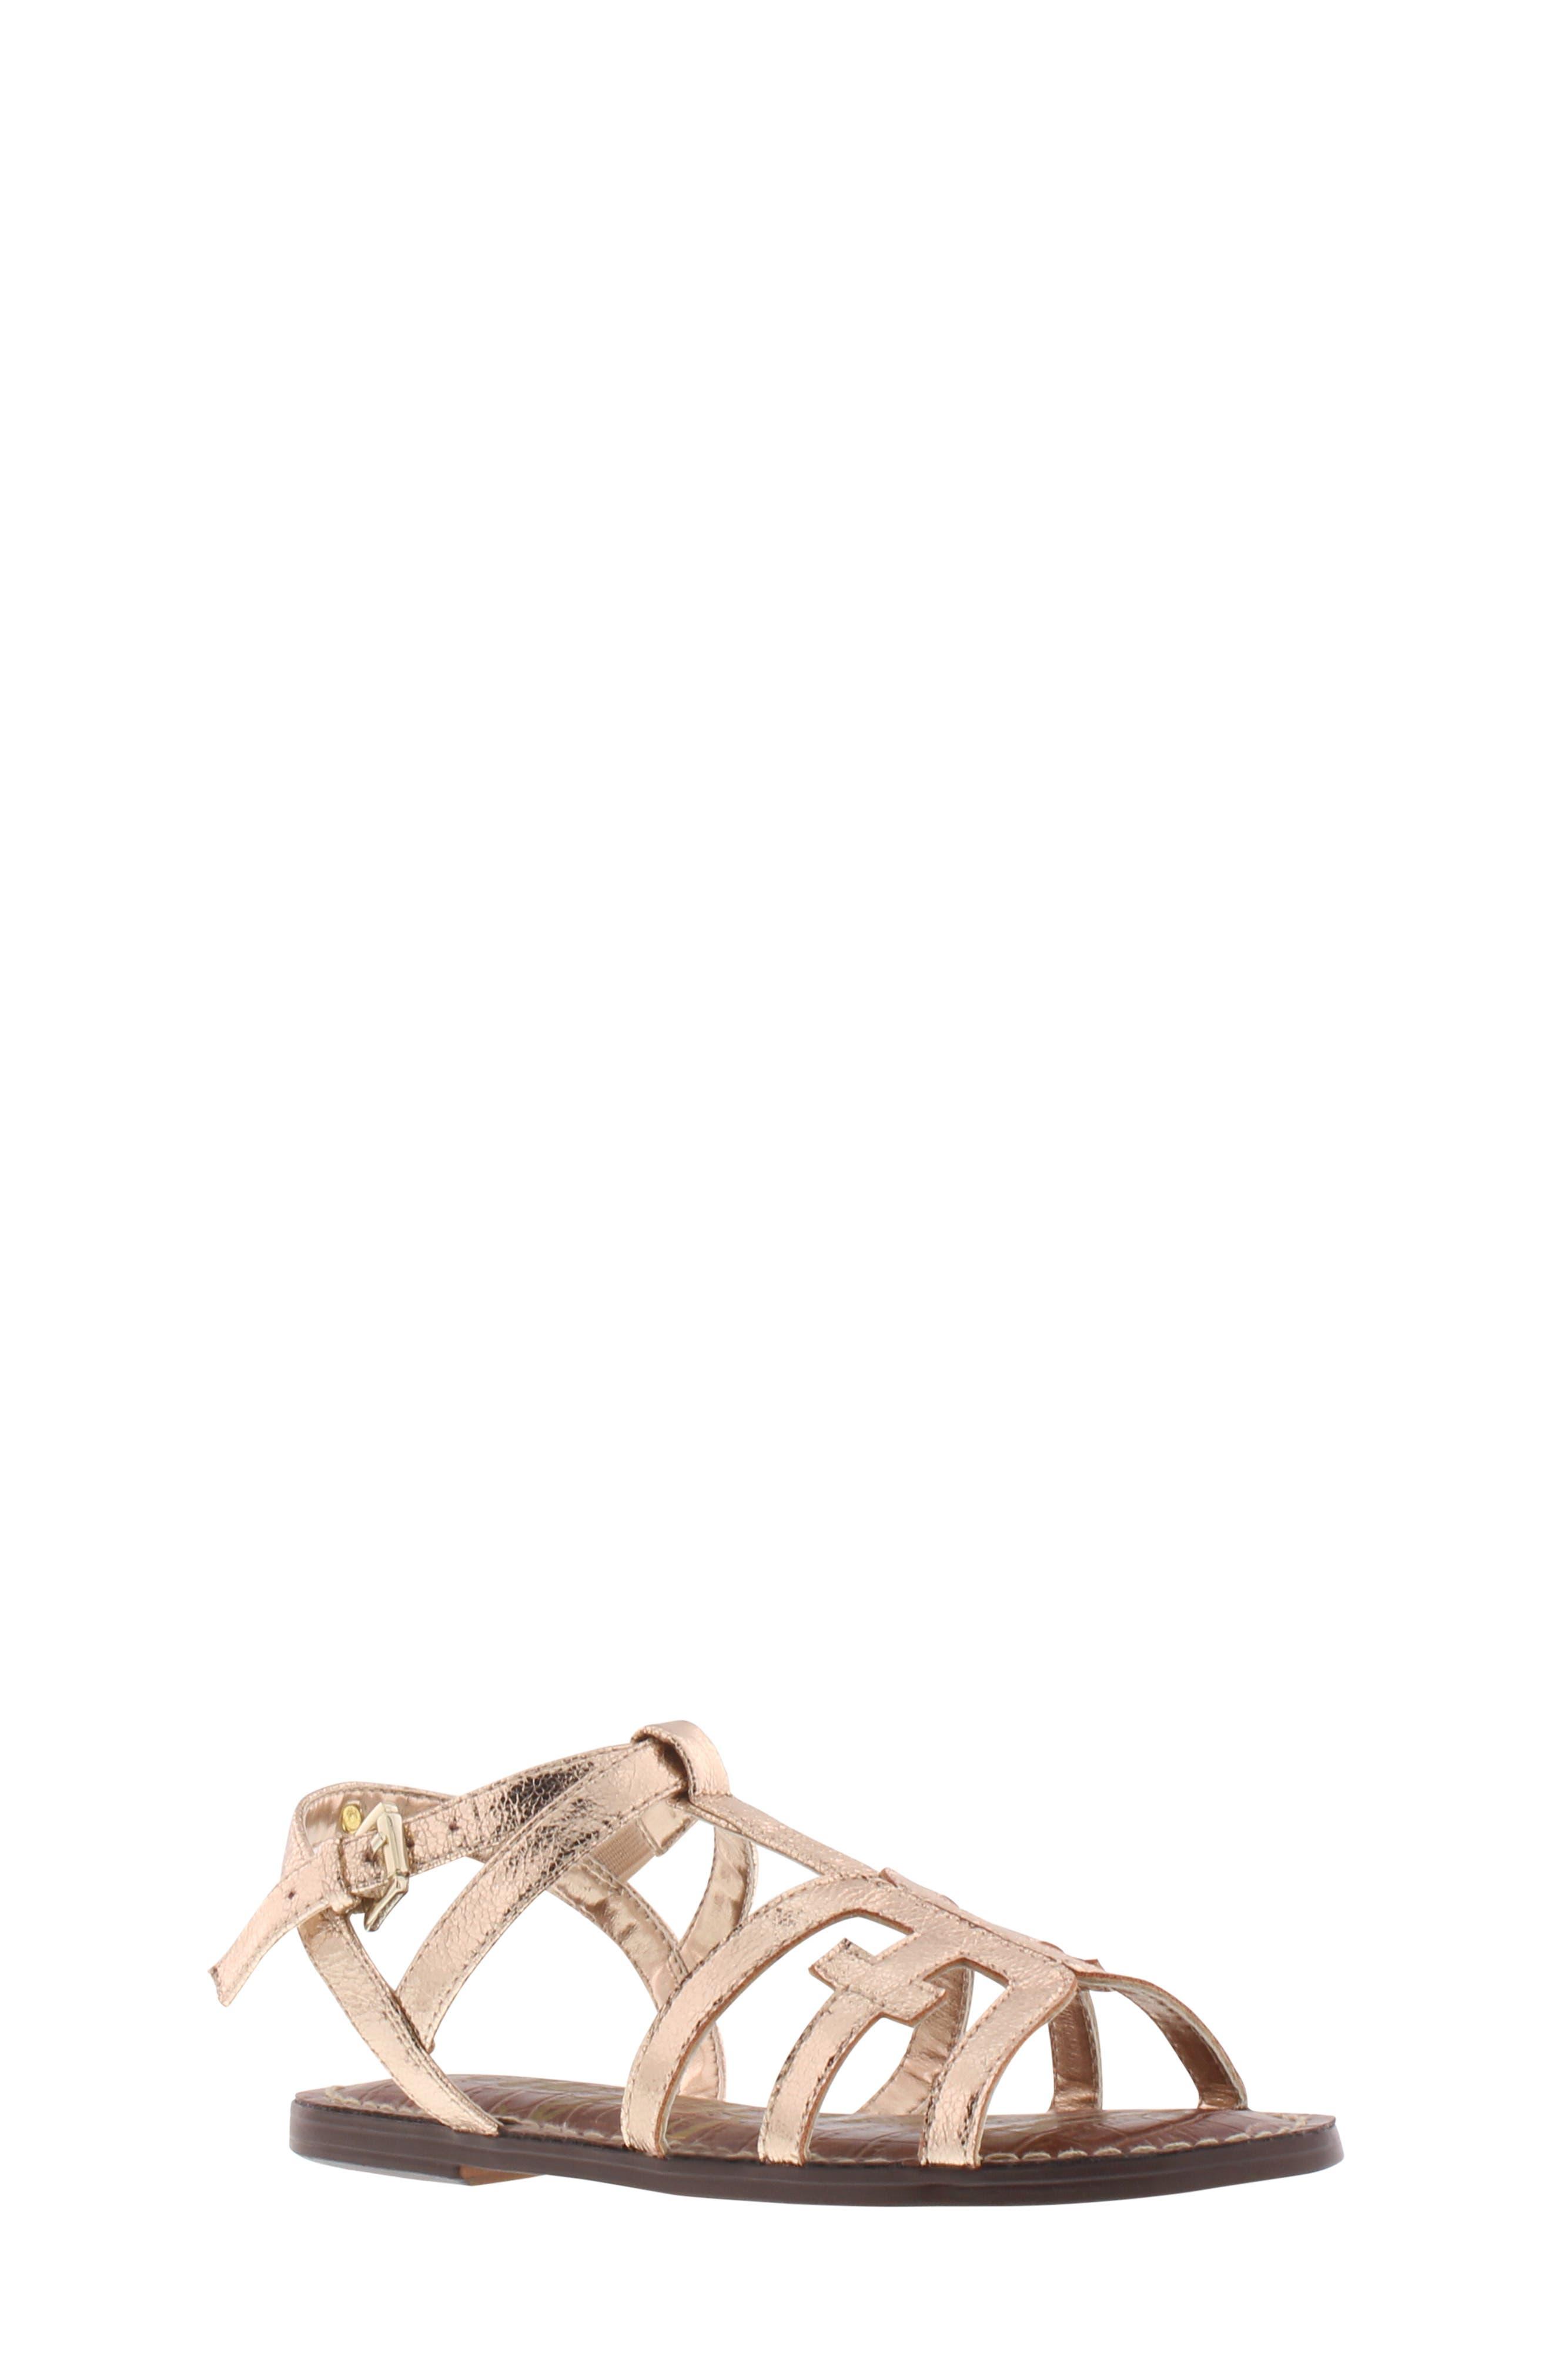 Girls Sam Edelman Gigi Cara Glitter Sandal